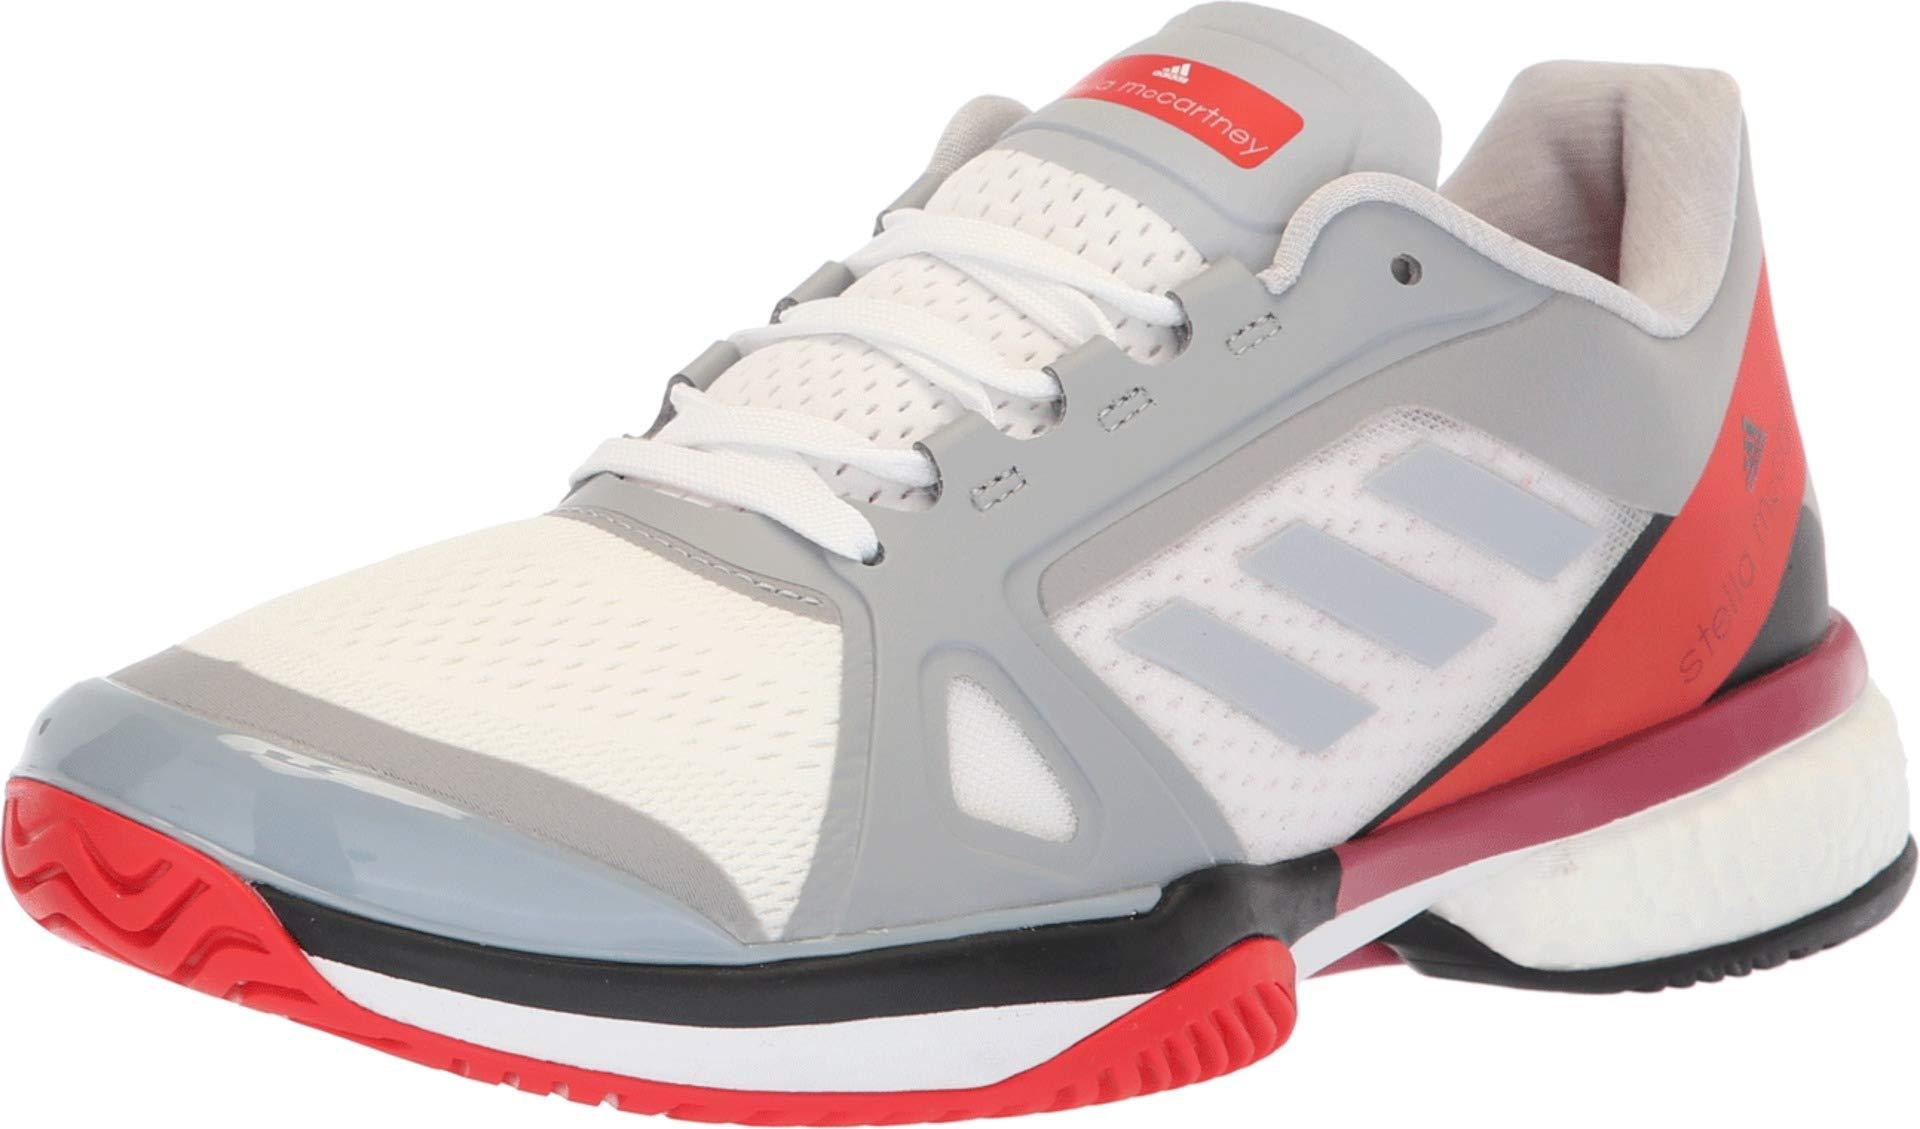 adidas Women's aSMC Barricade Boost Mid Grey/Mid Grey/Core Red 9 B US by adidas